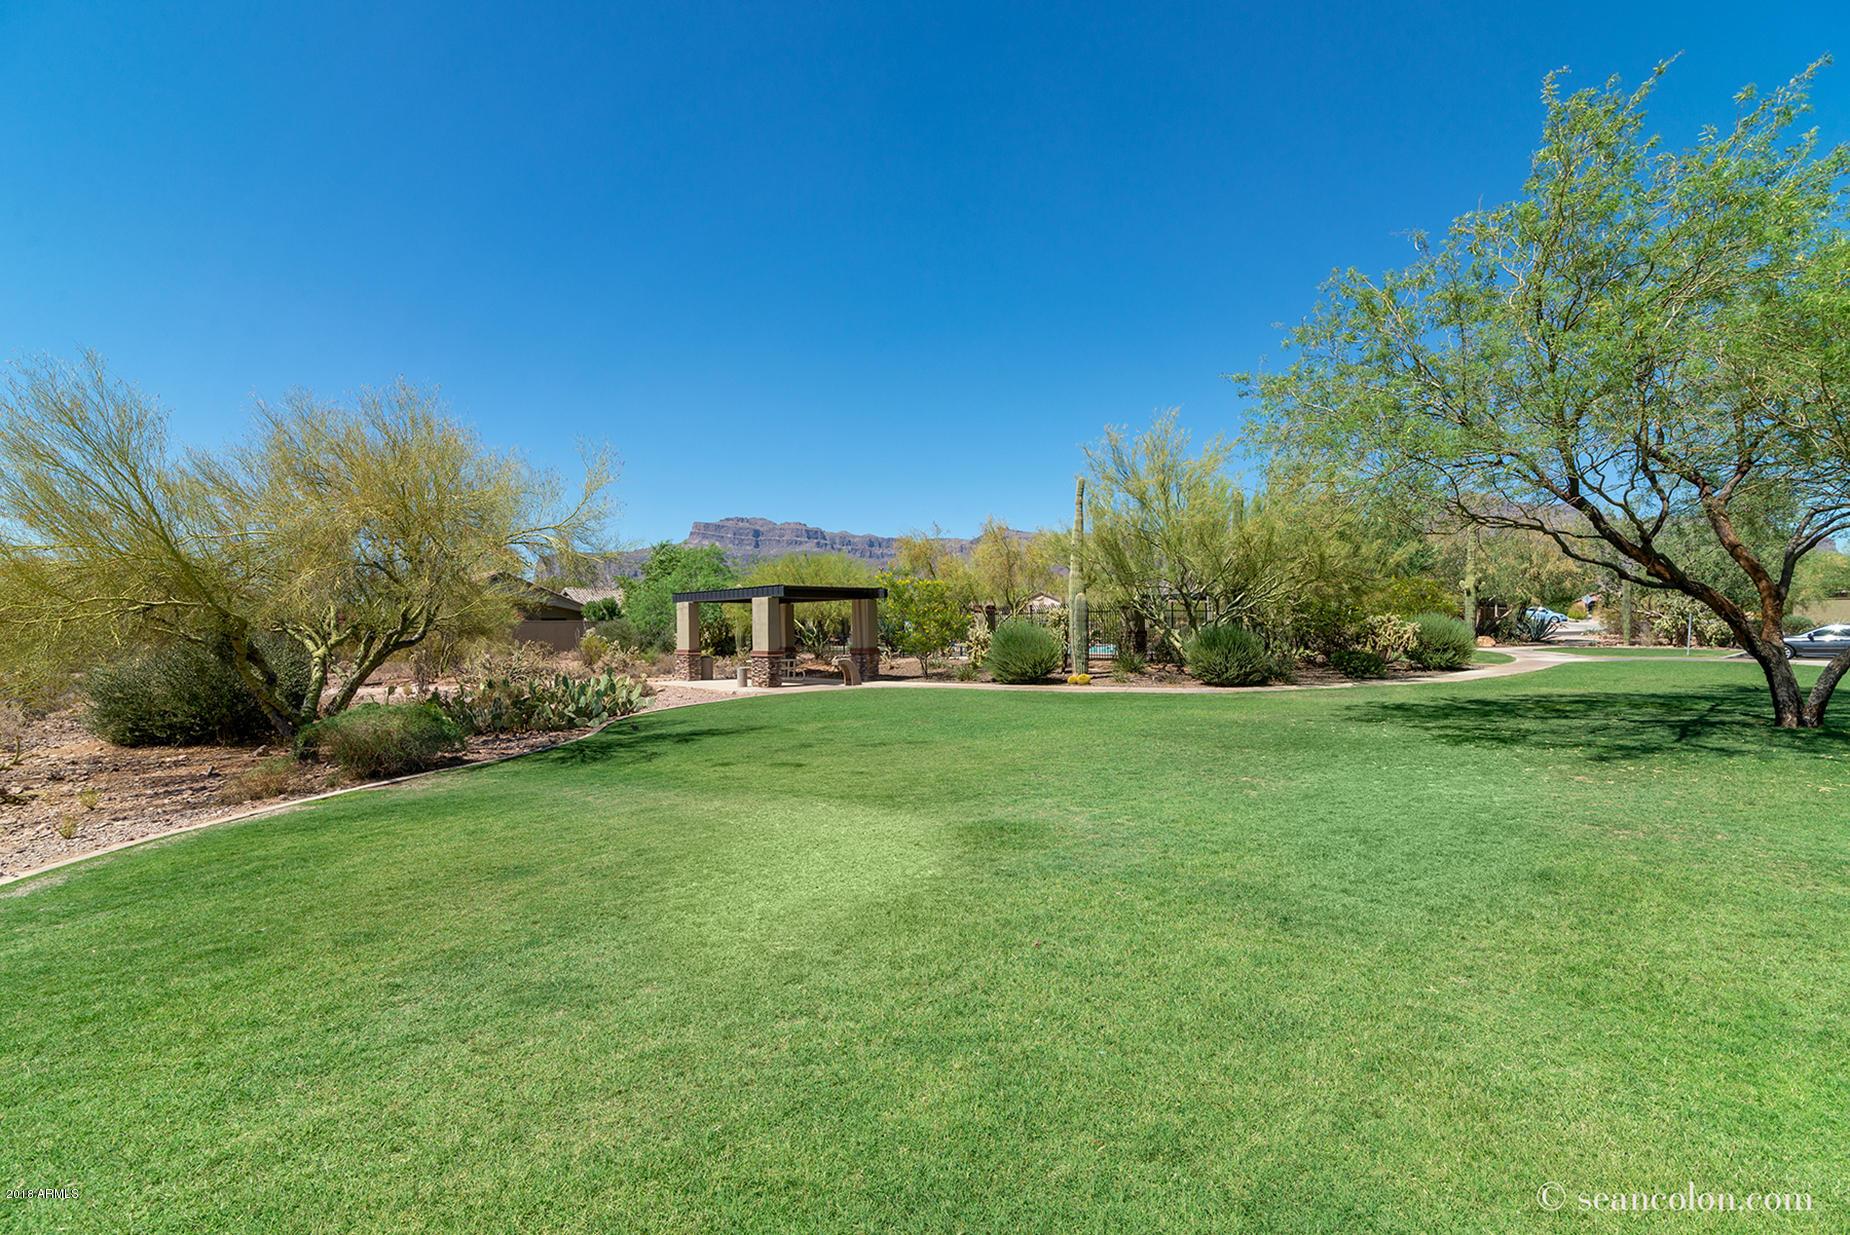 MLS 5832620 4184 S ALAMANDAS Way, Gold Canyon, AZ 85118 Gold Canyon AZ Superstition Foothills